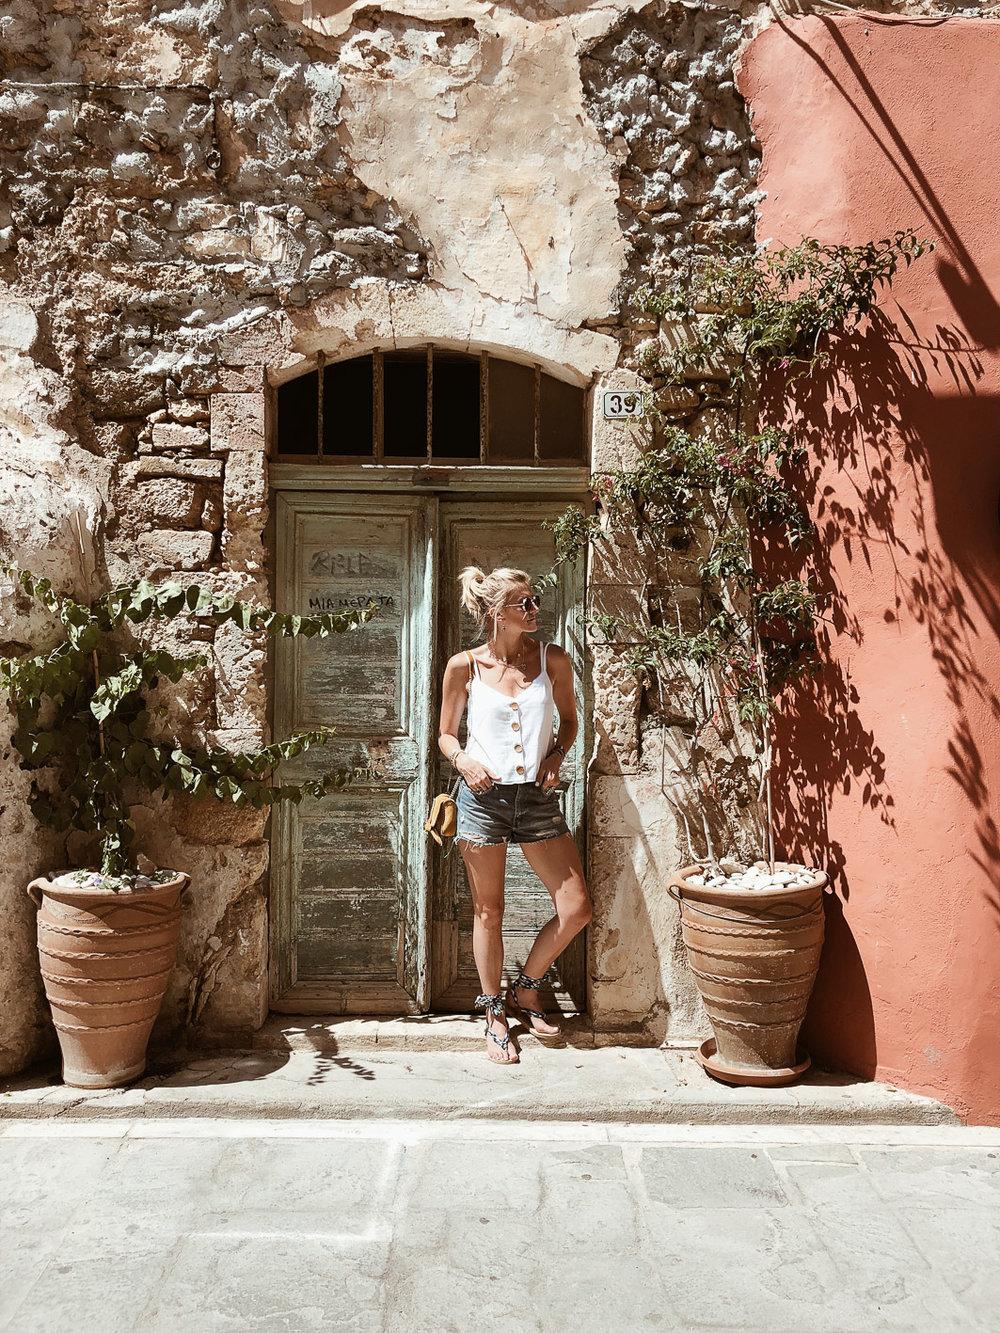 Carnet sauvage - Blog voyage Crète, visiter Rethymnon